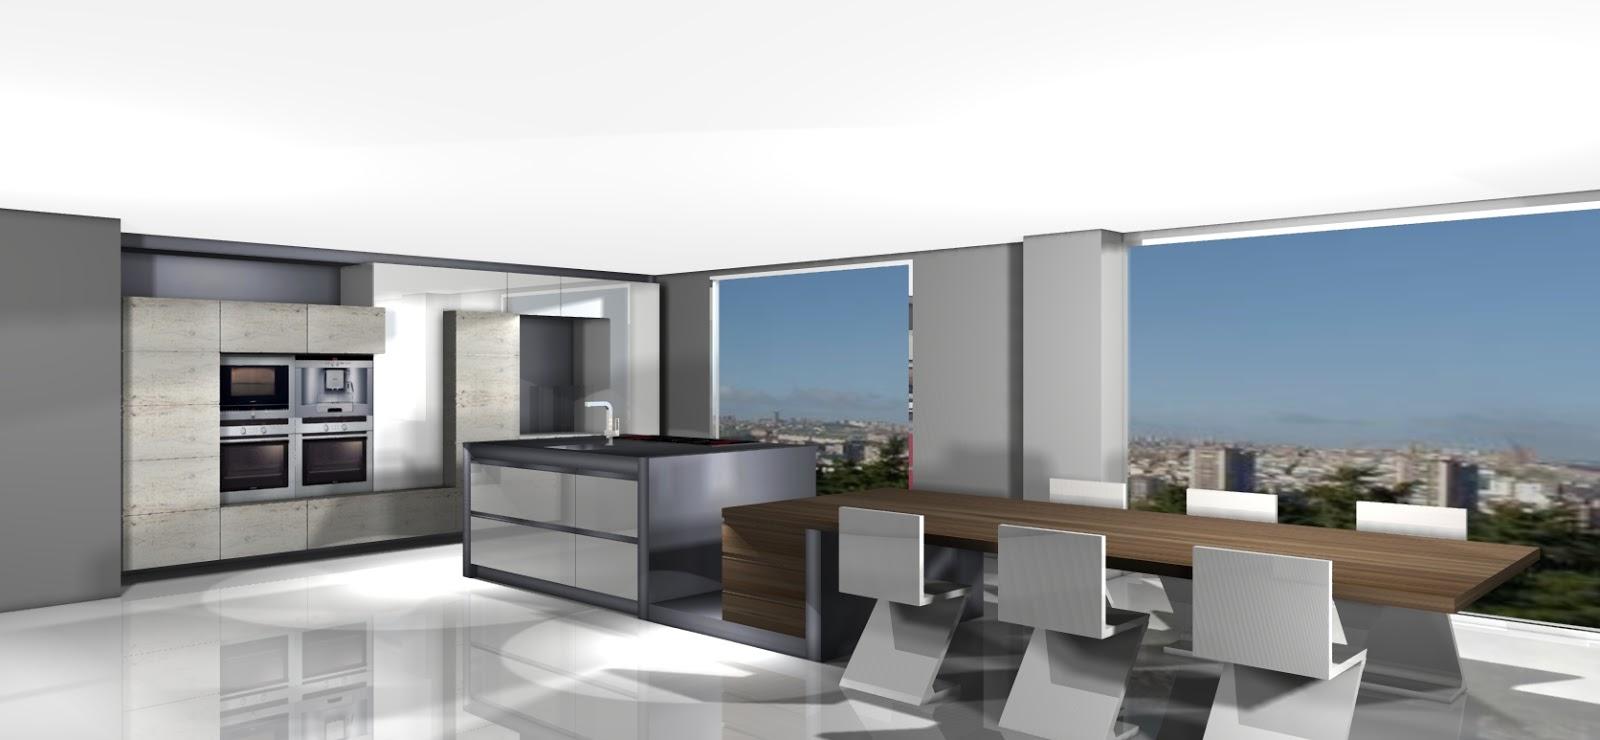 Centro KitchenmasterMadrid 3D febrero 2013